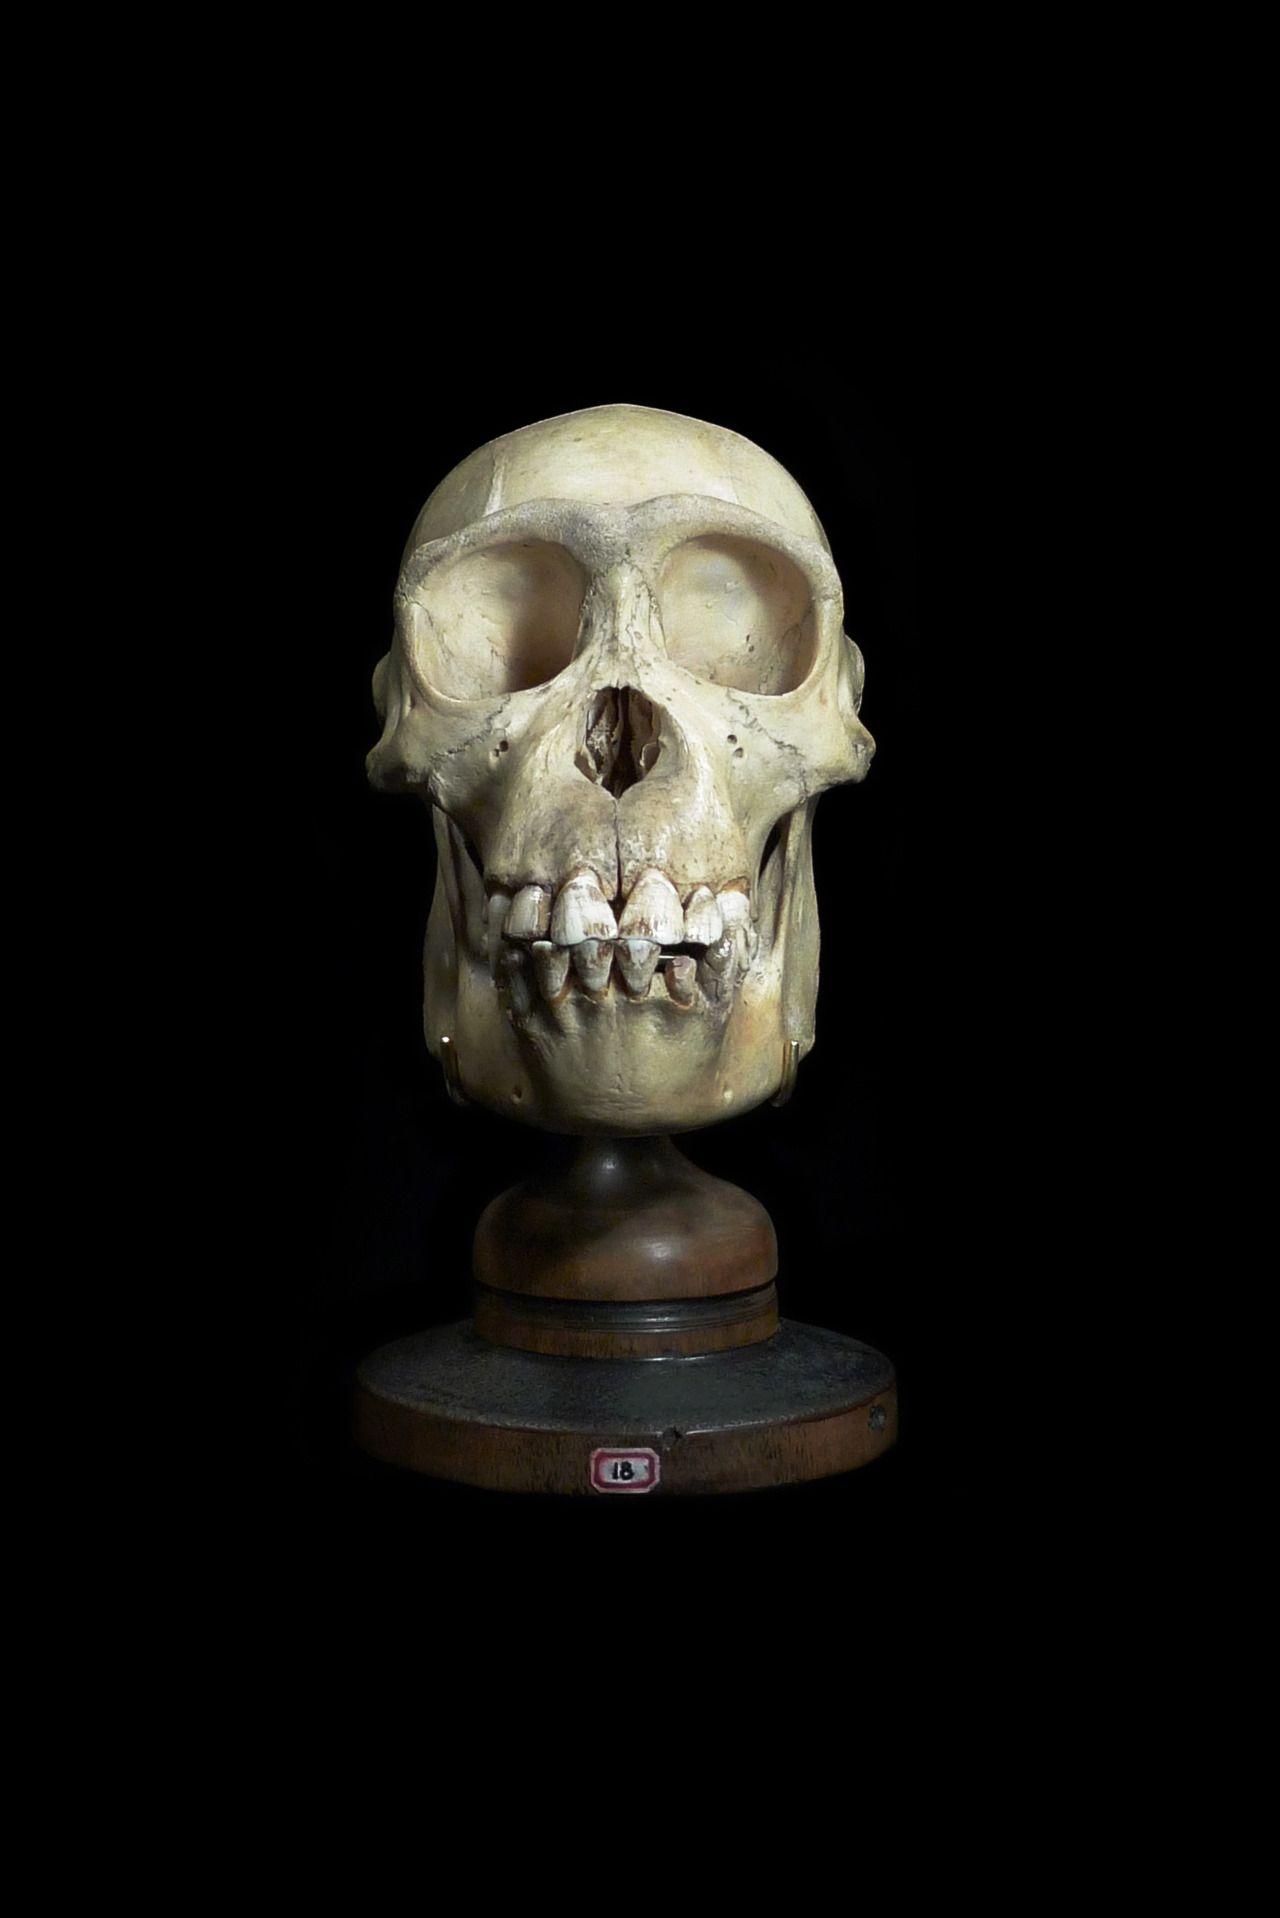 Primate Skull | Primates | Pinterest